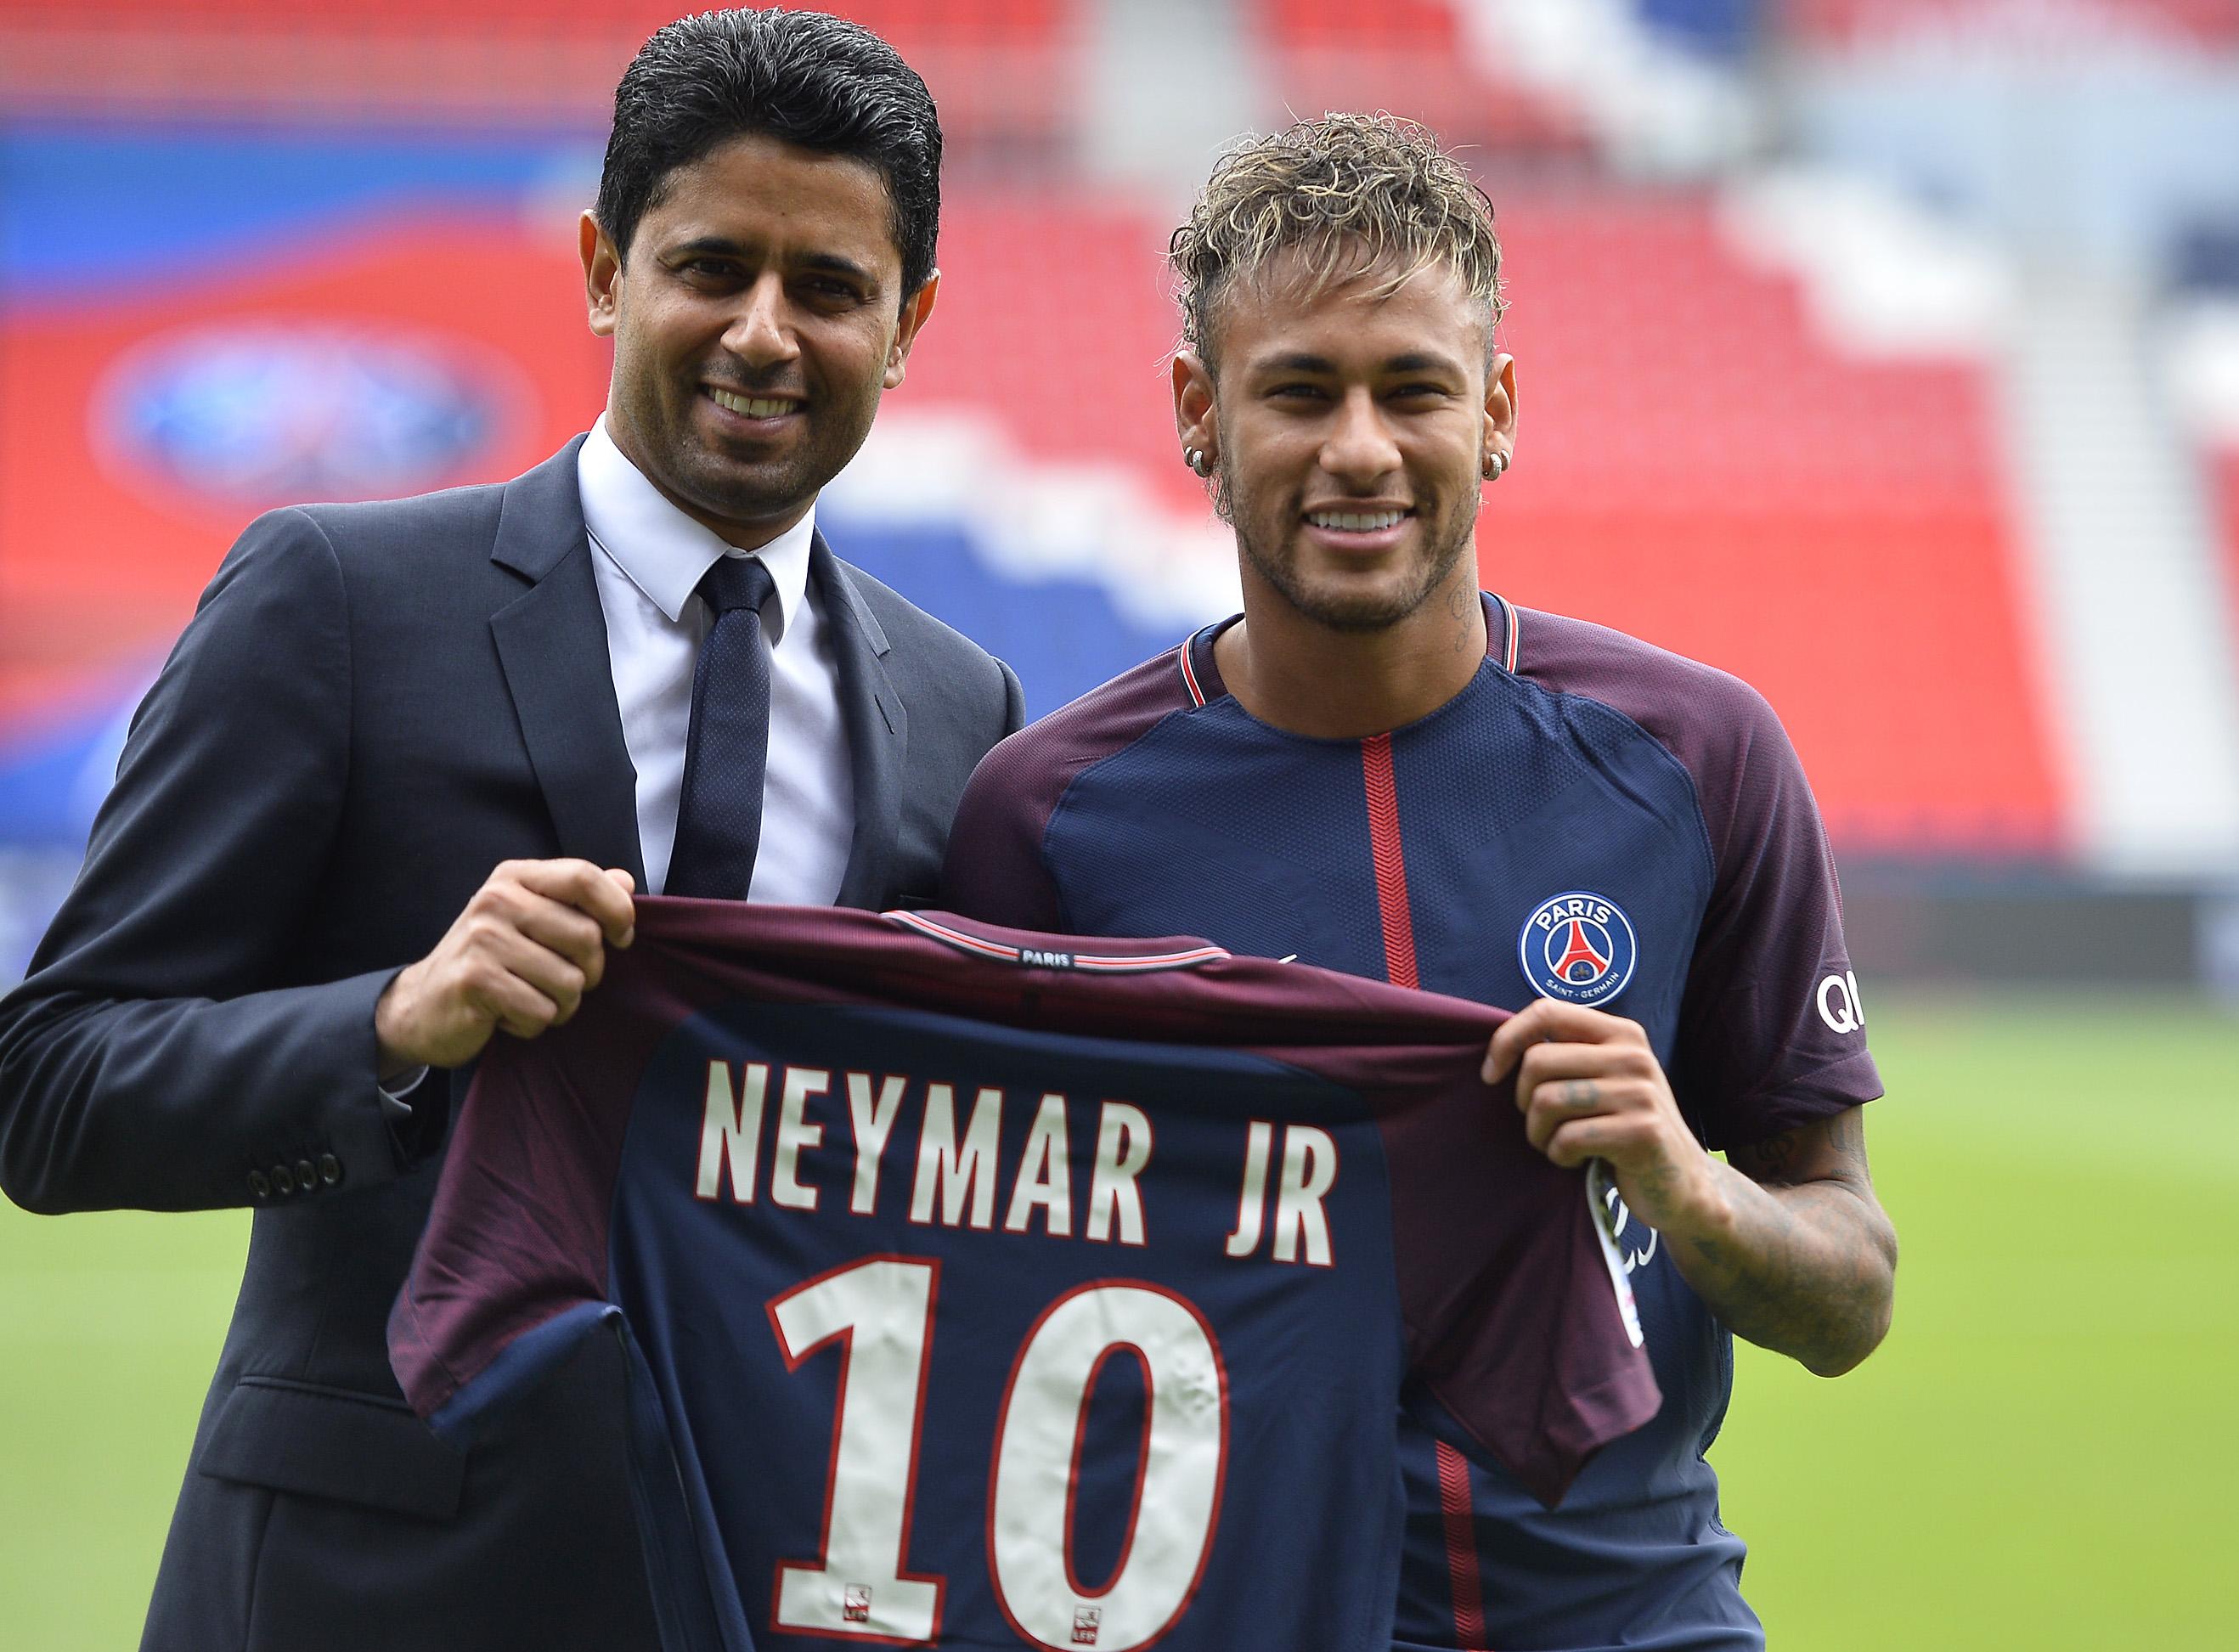 Barcelona Sued Neymar, so Neymar Sued Them Right Back